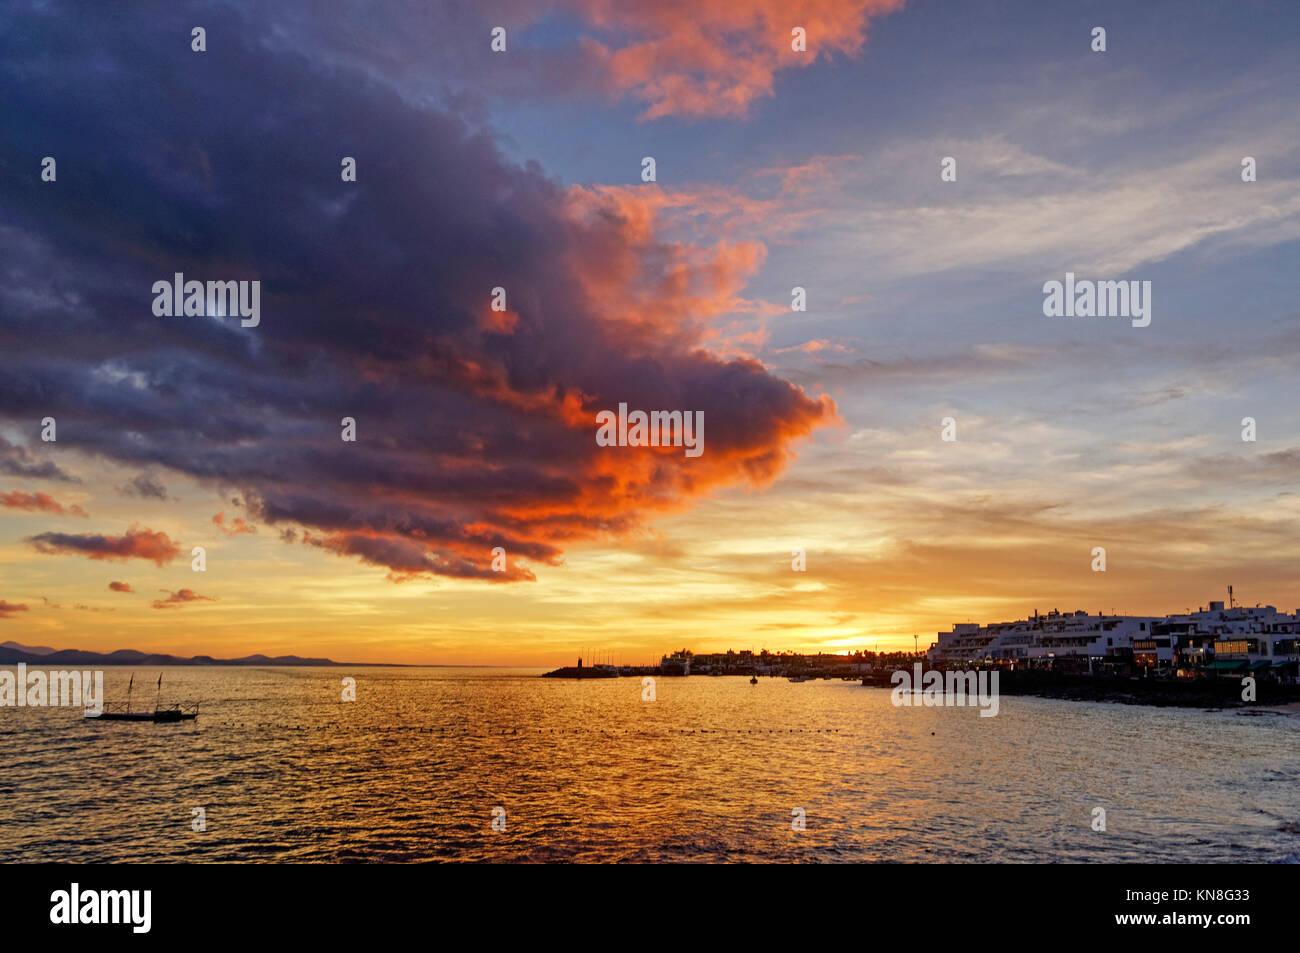 Playa Blanca, sunset, Lanzarote, Canary Islands, Spain - Stock Image